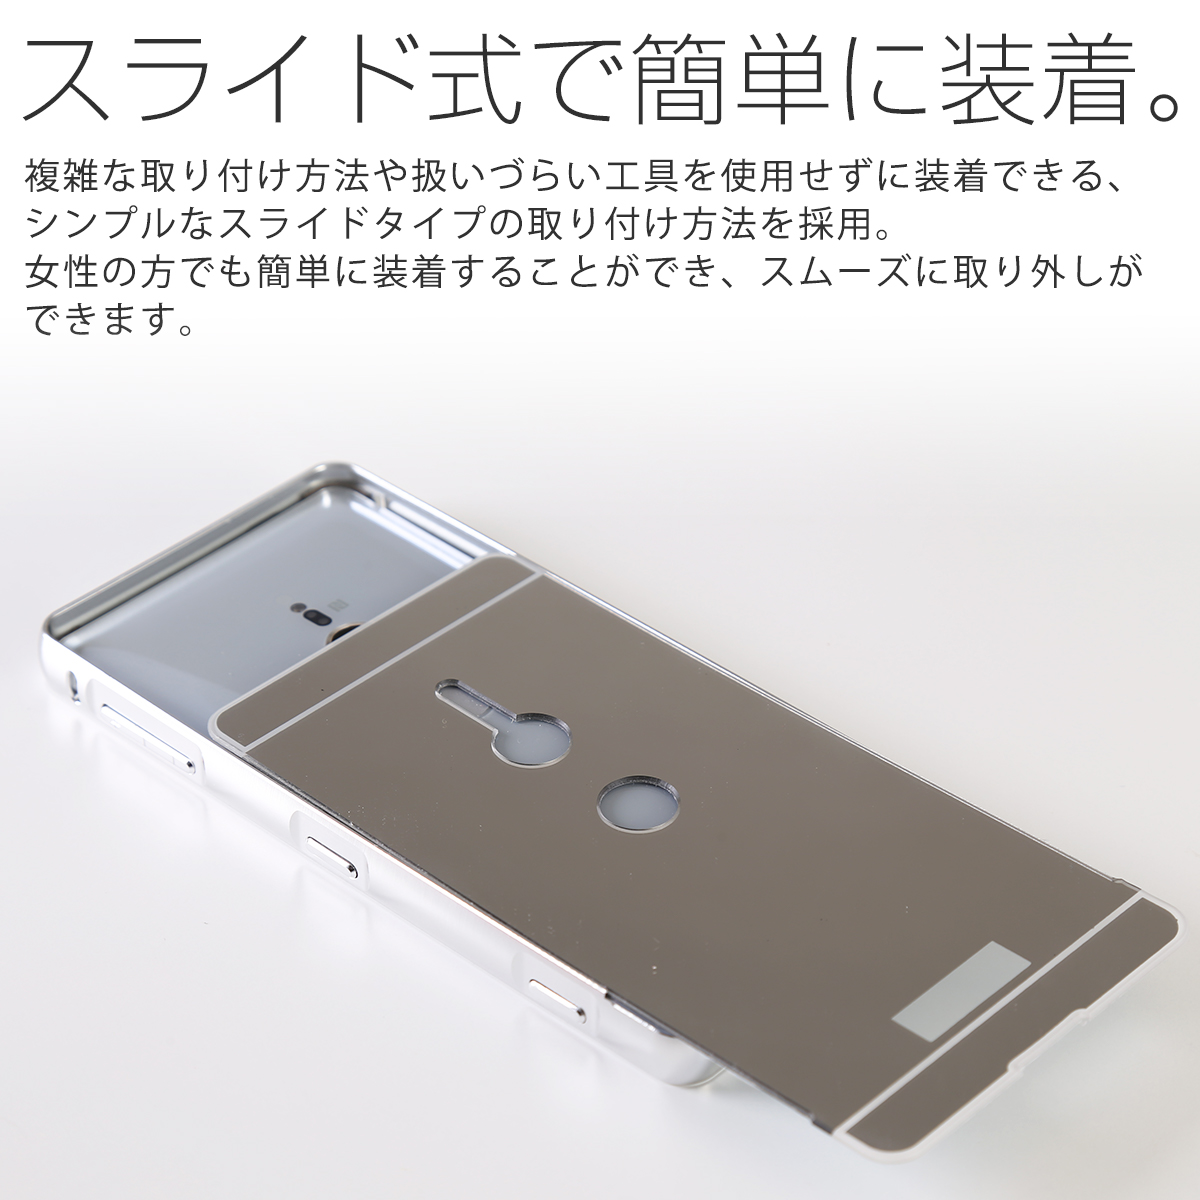 Xperia XZ2 背面パネル付きバンパーメタルケース